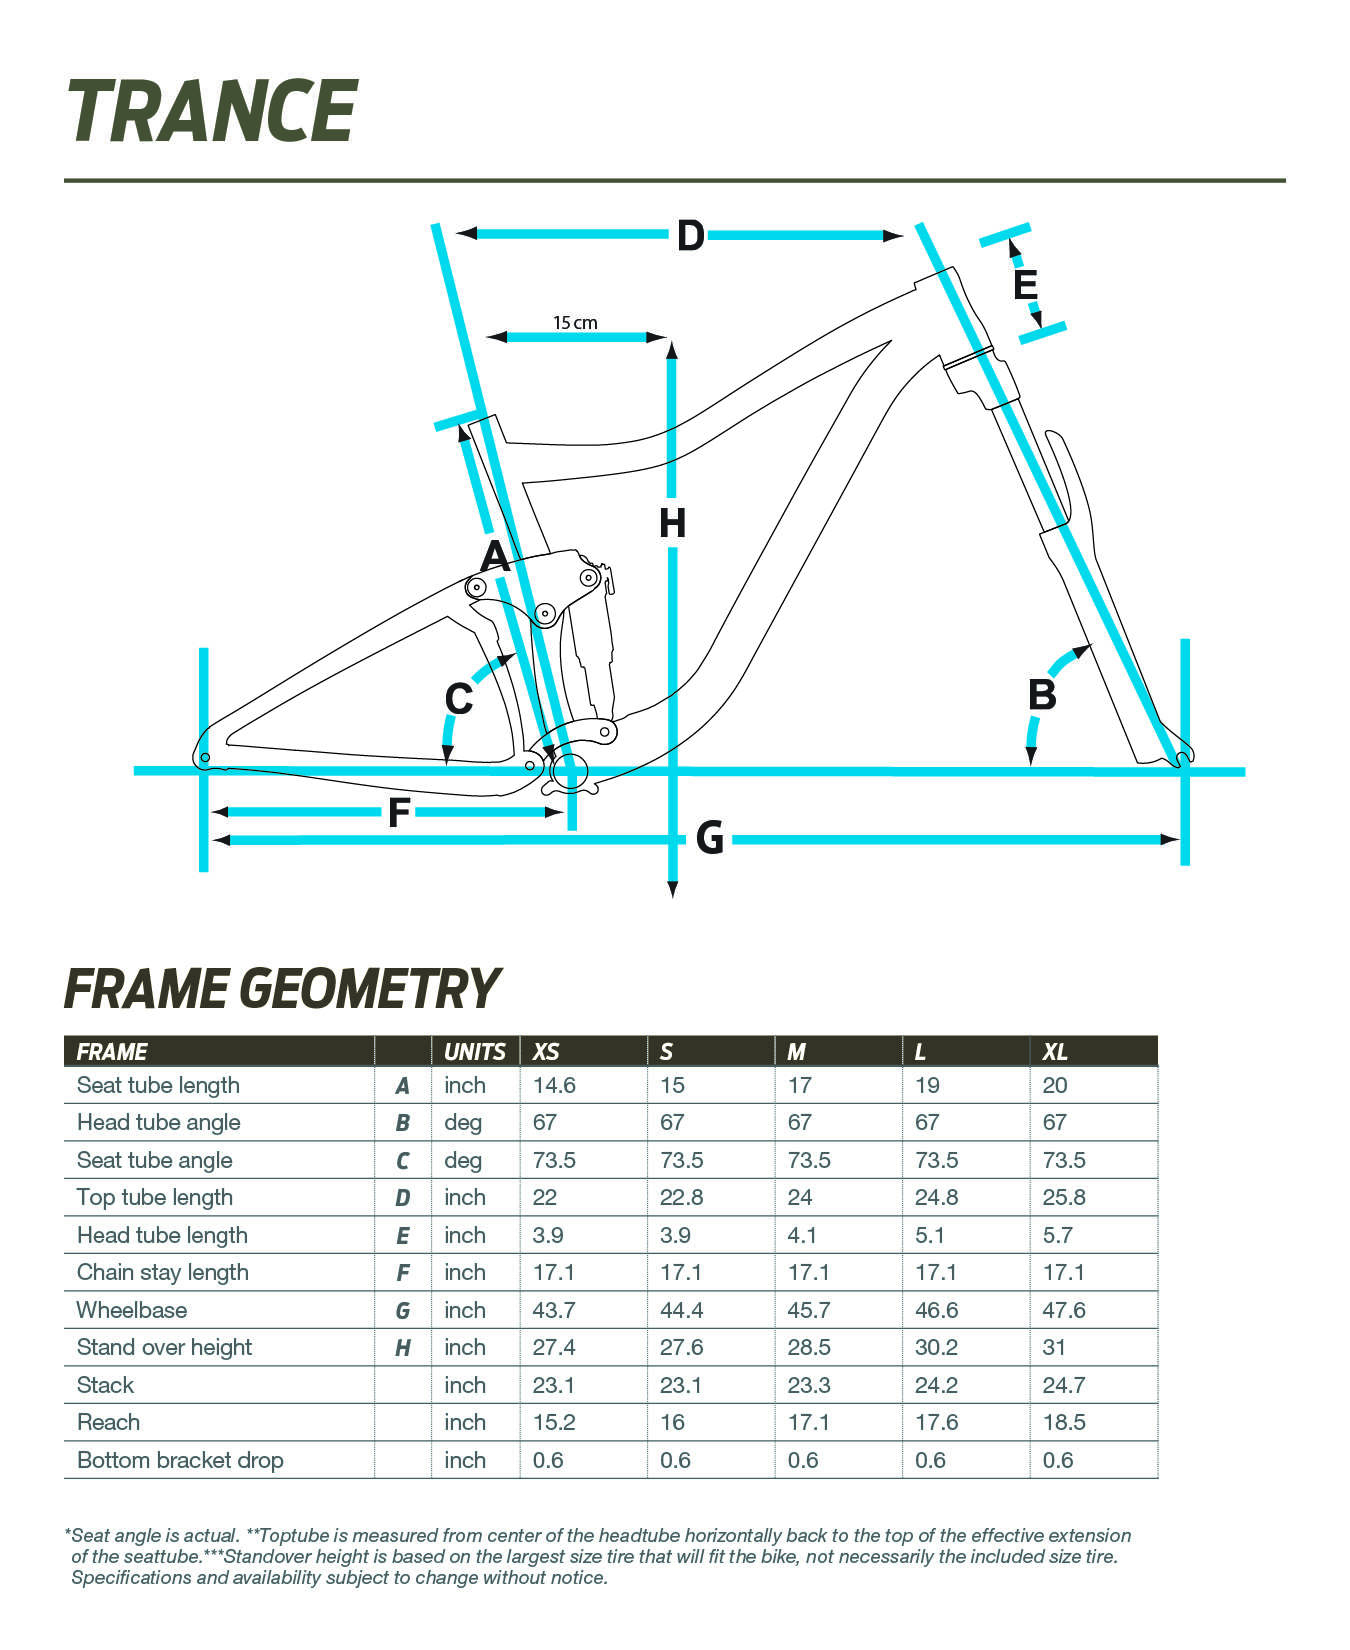 Giant Trance geometry chart